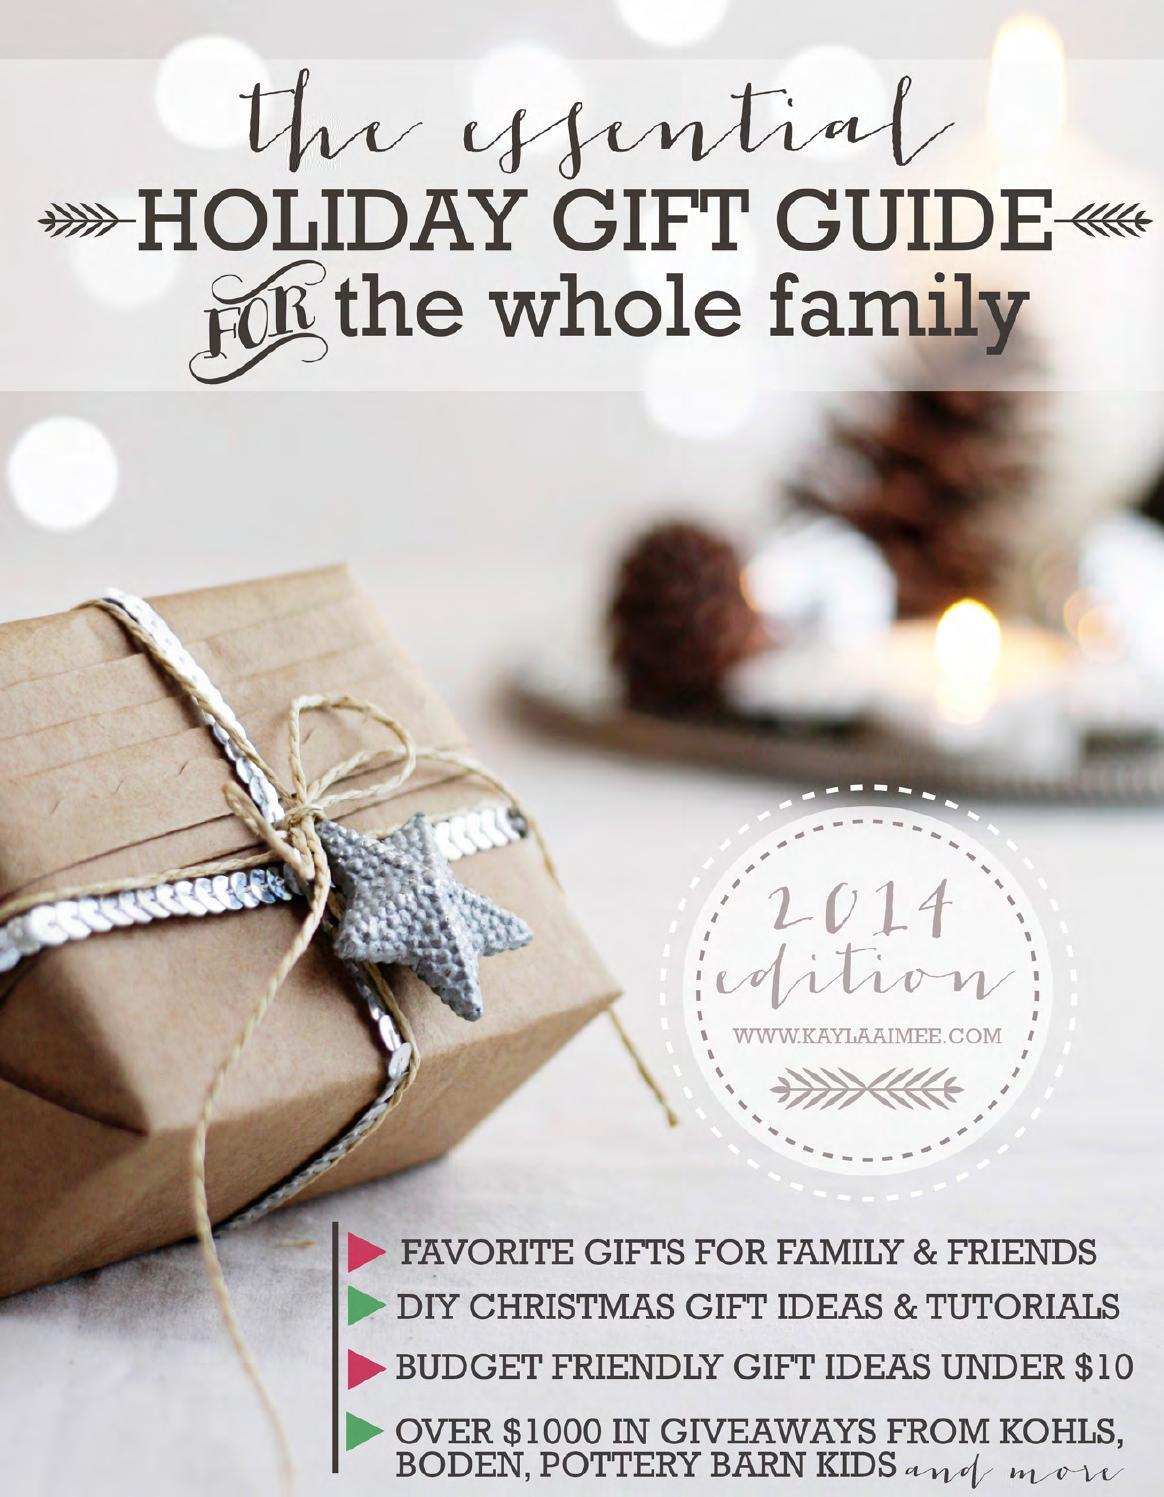 2014 Holiday Gift Guide by Kayla Aimee by Kayla Aimee - issuu